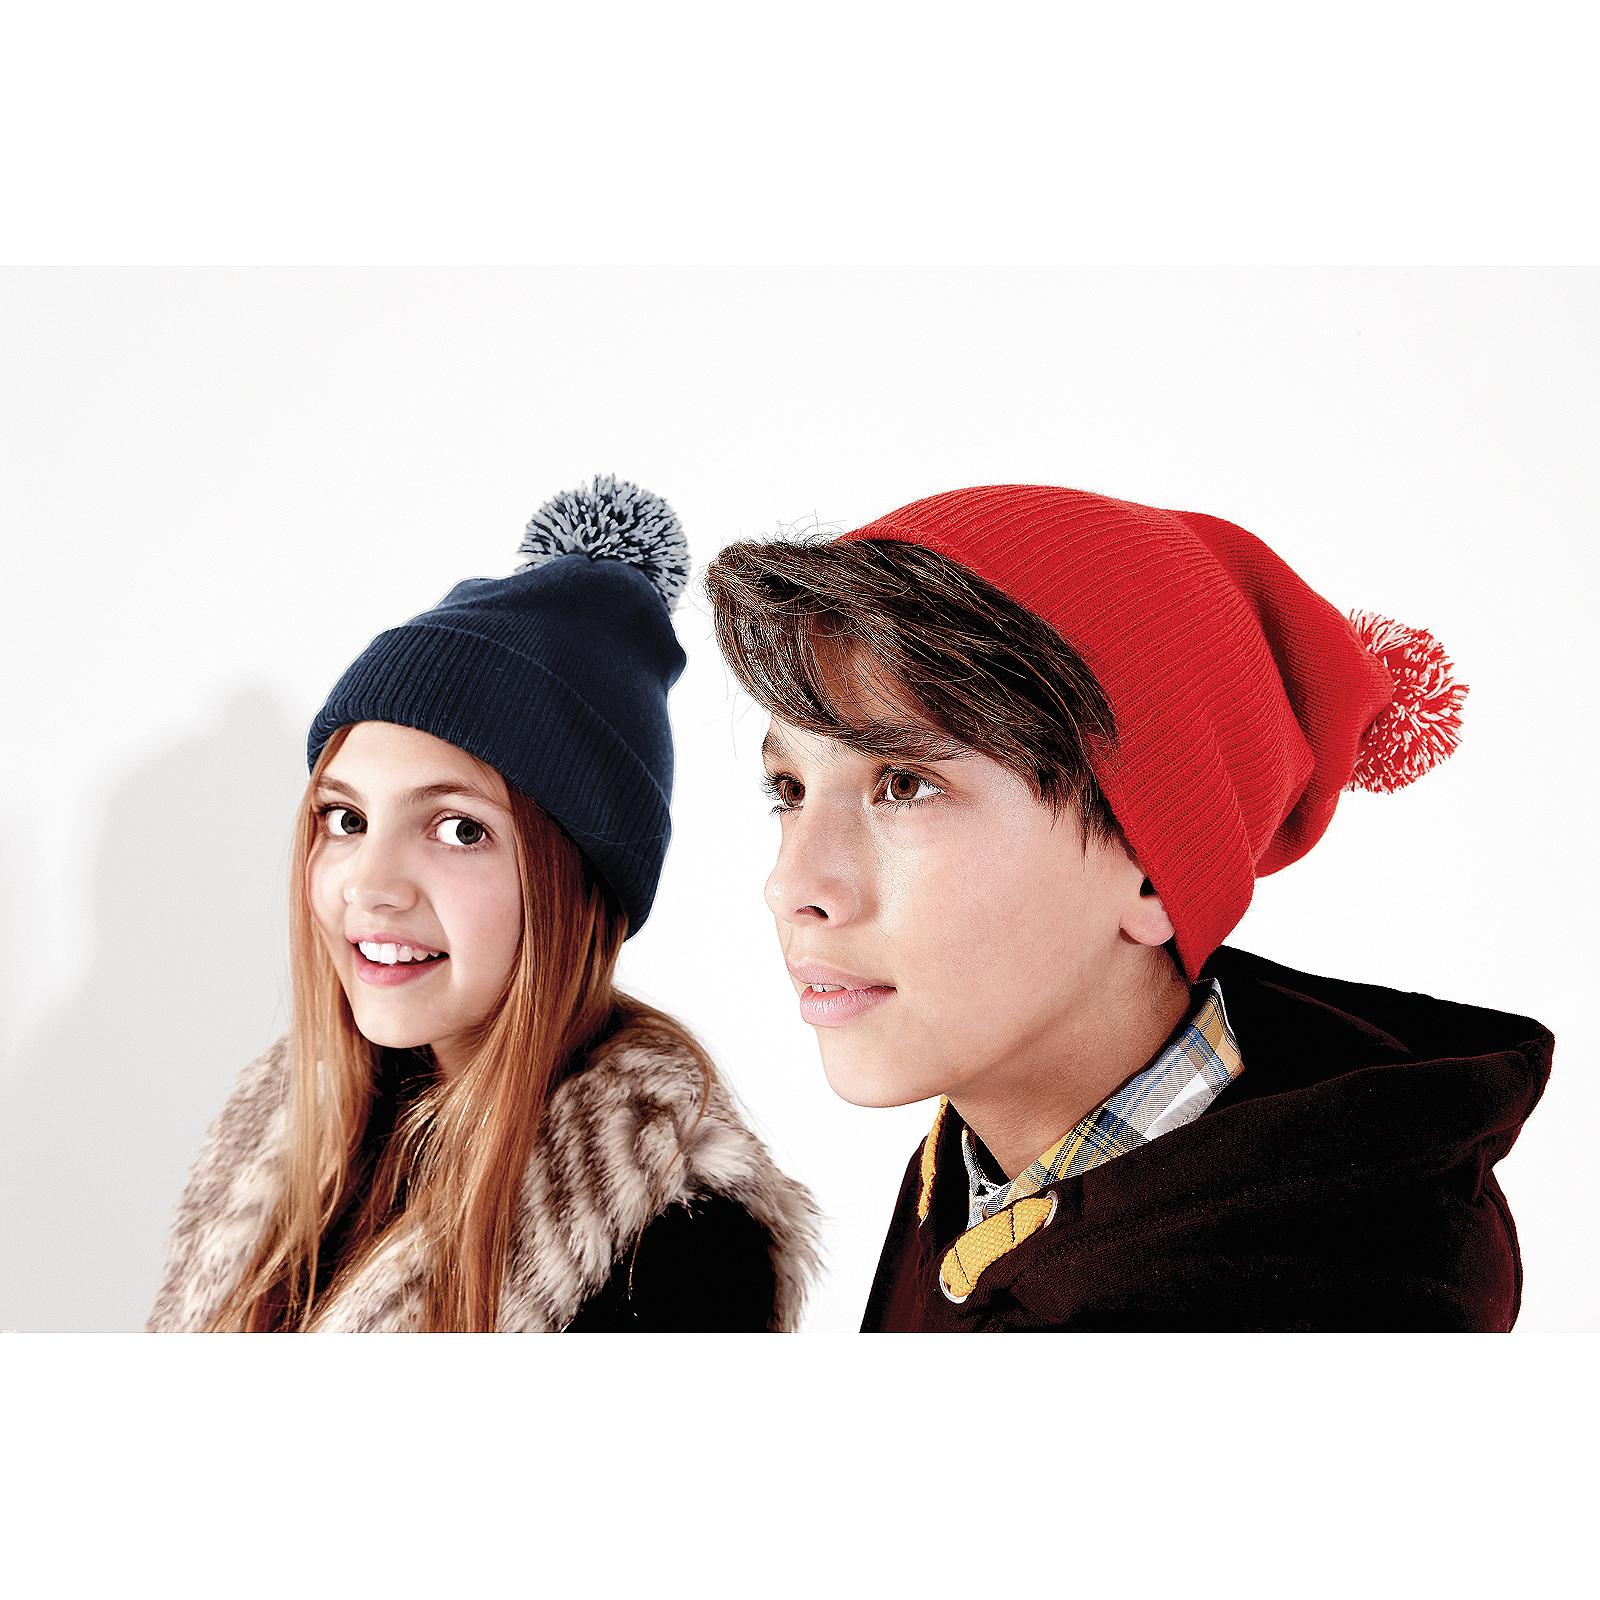 d7bd9ff681c Sentinel Beechfield Kids Snowstar Duo Beanie Hat Boys Girls Winter Warm  Bobble Winter Cap